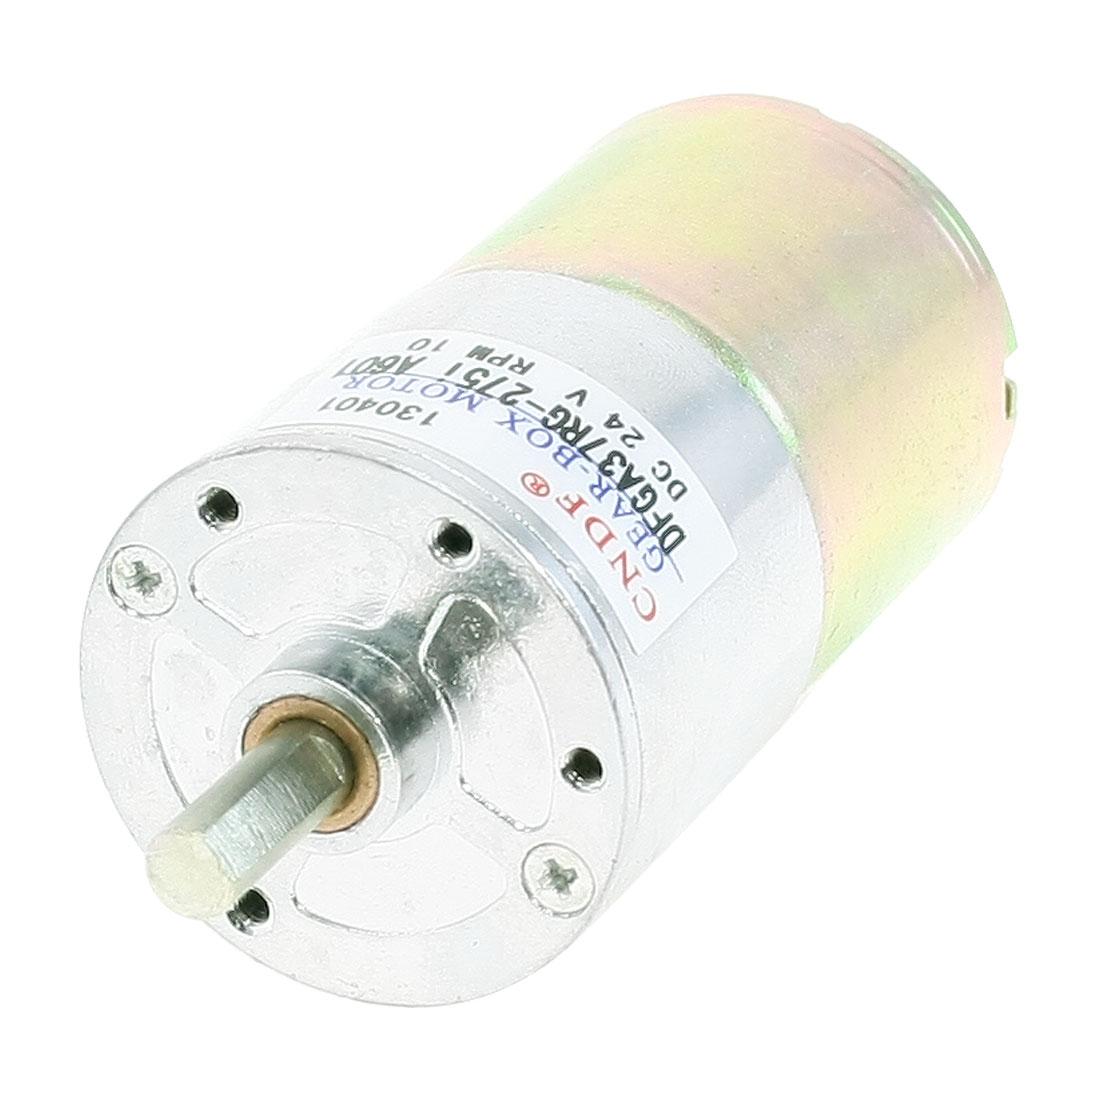 13.14kg.cm Torque Terminal Magnetic Gear Motor 10 RPM 24V DC